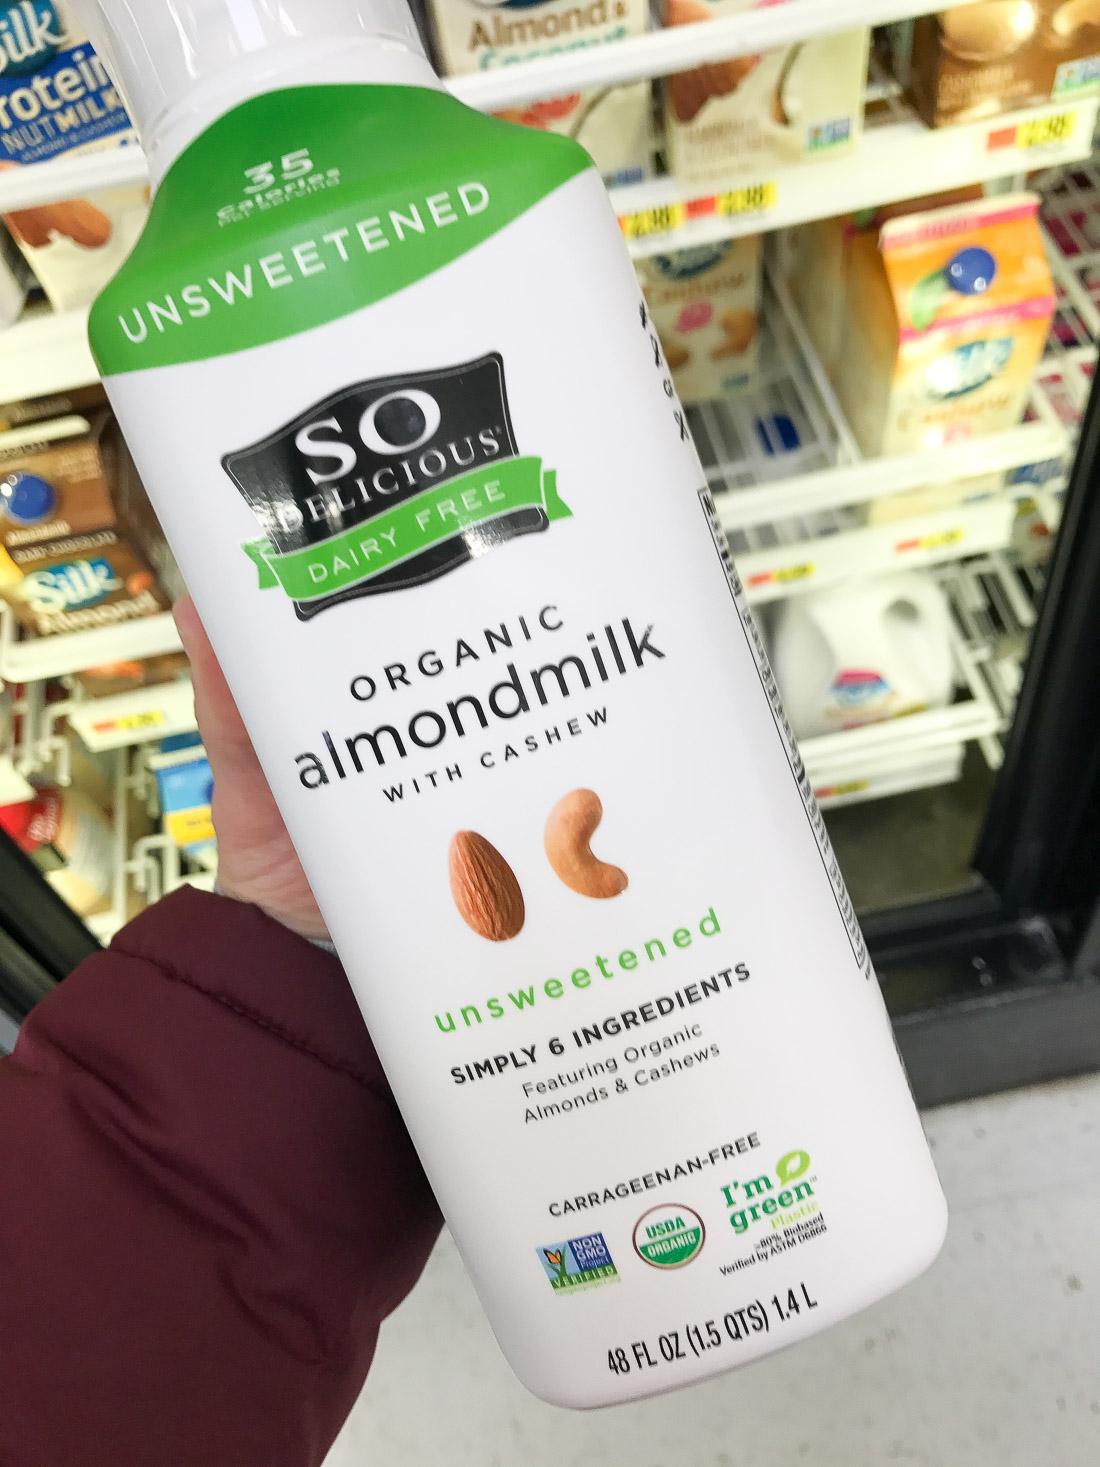 So Delicious Almondmilk at Walmart